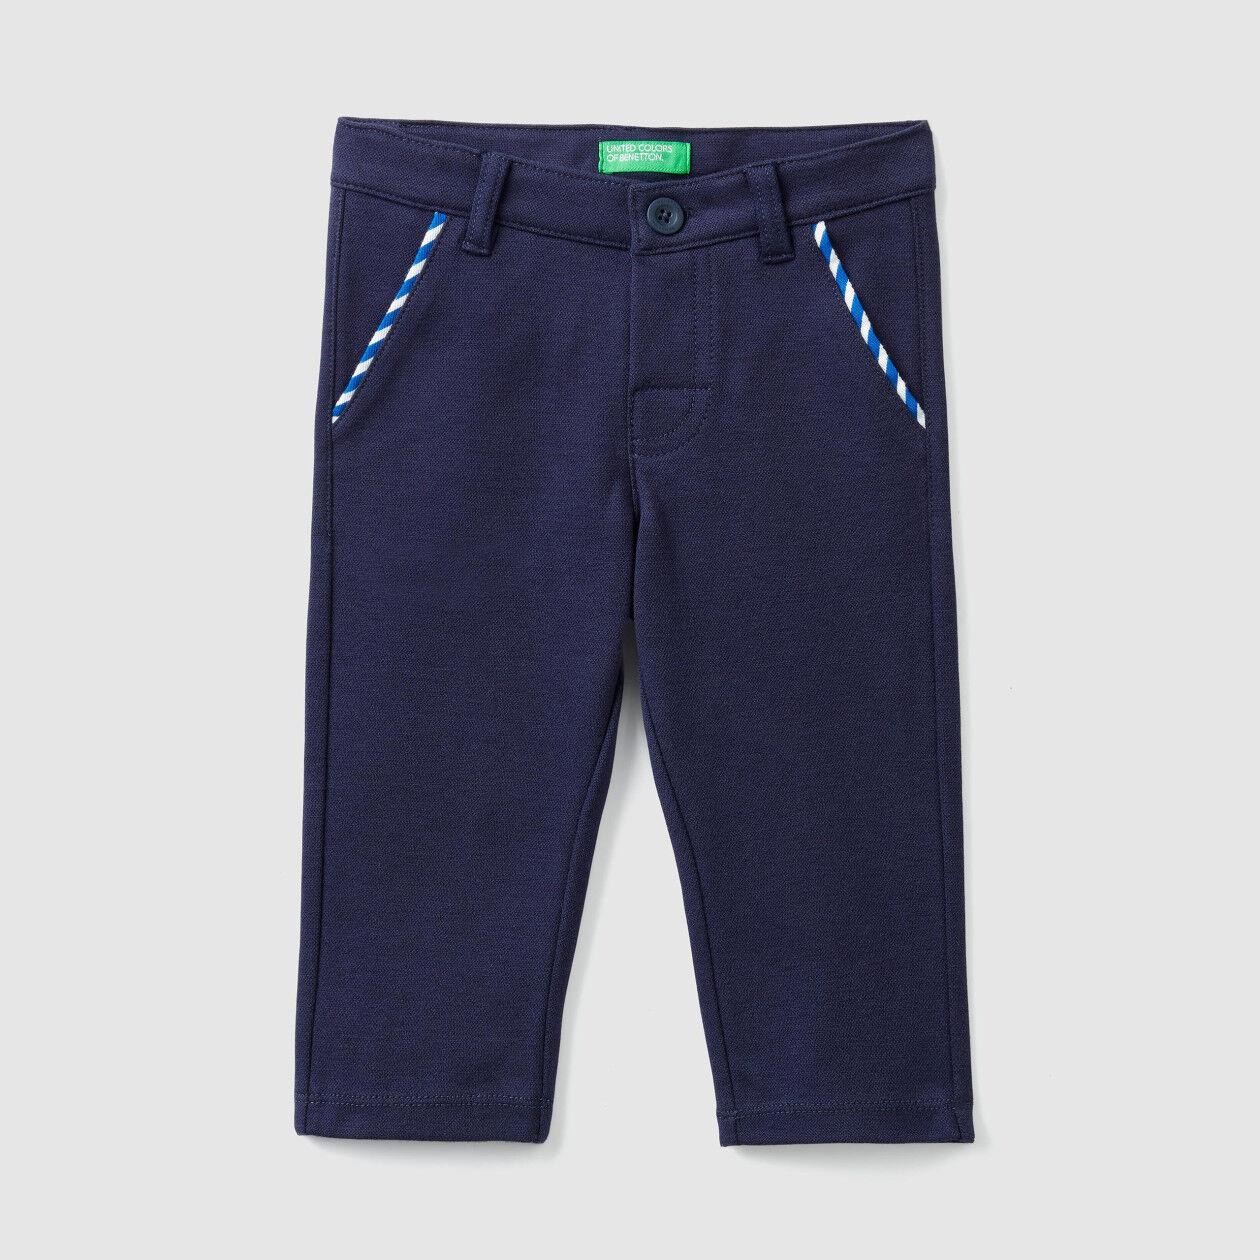 Trousers in stretch pique